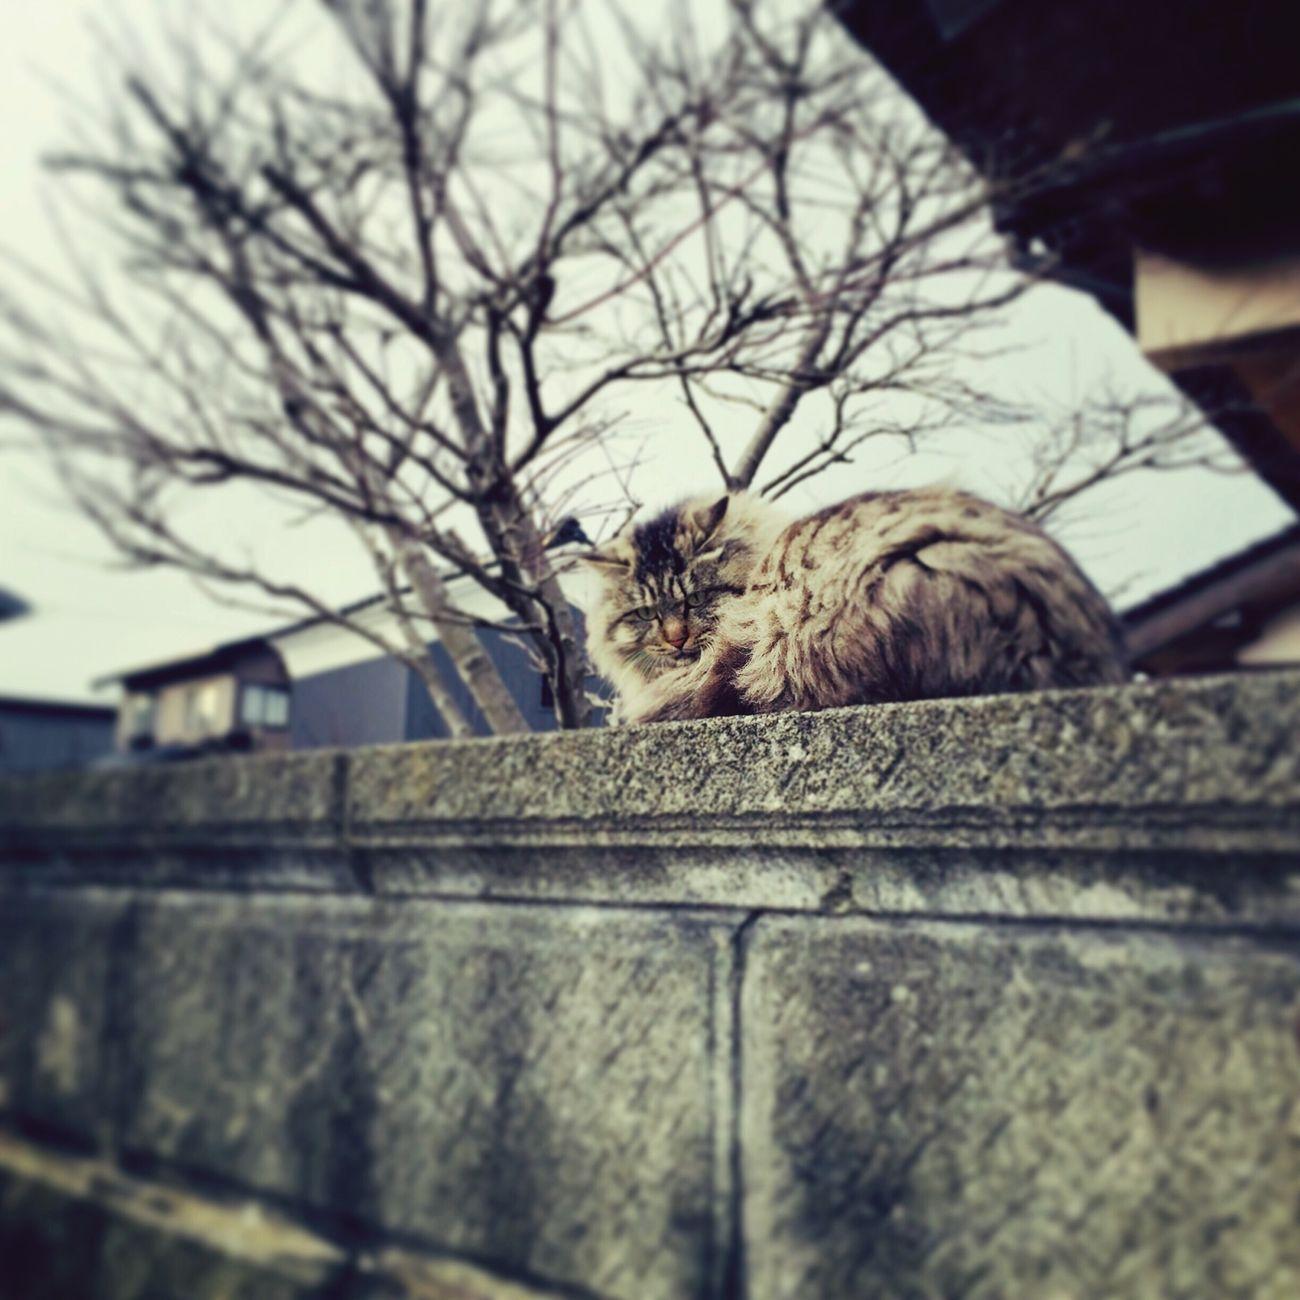 Cat Streetphotography